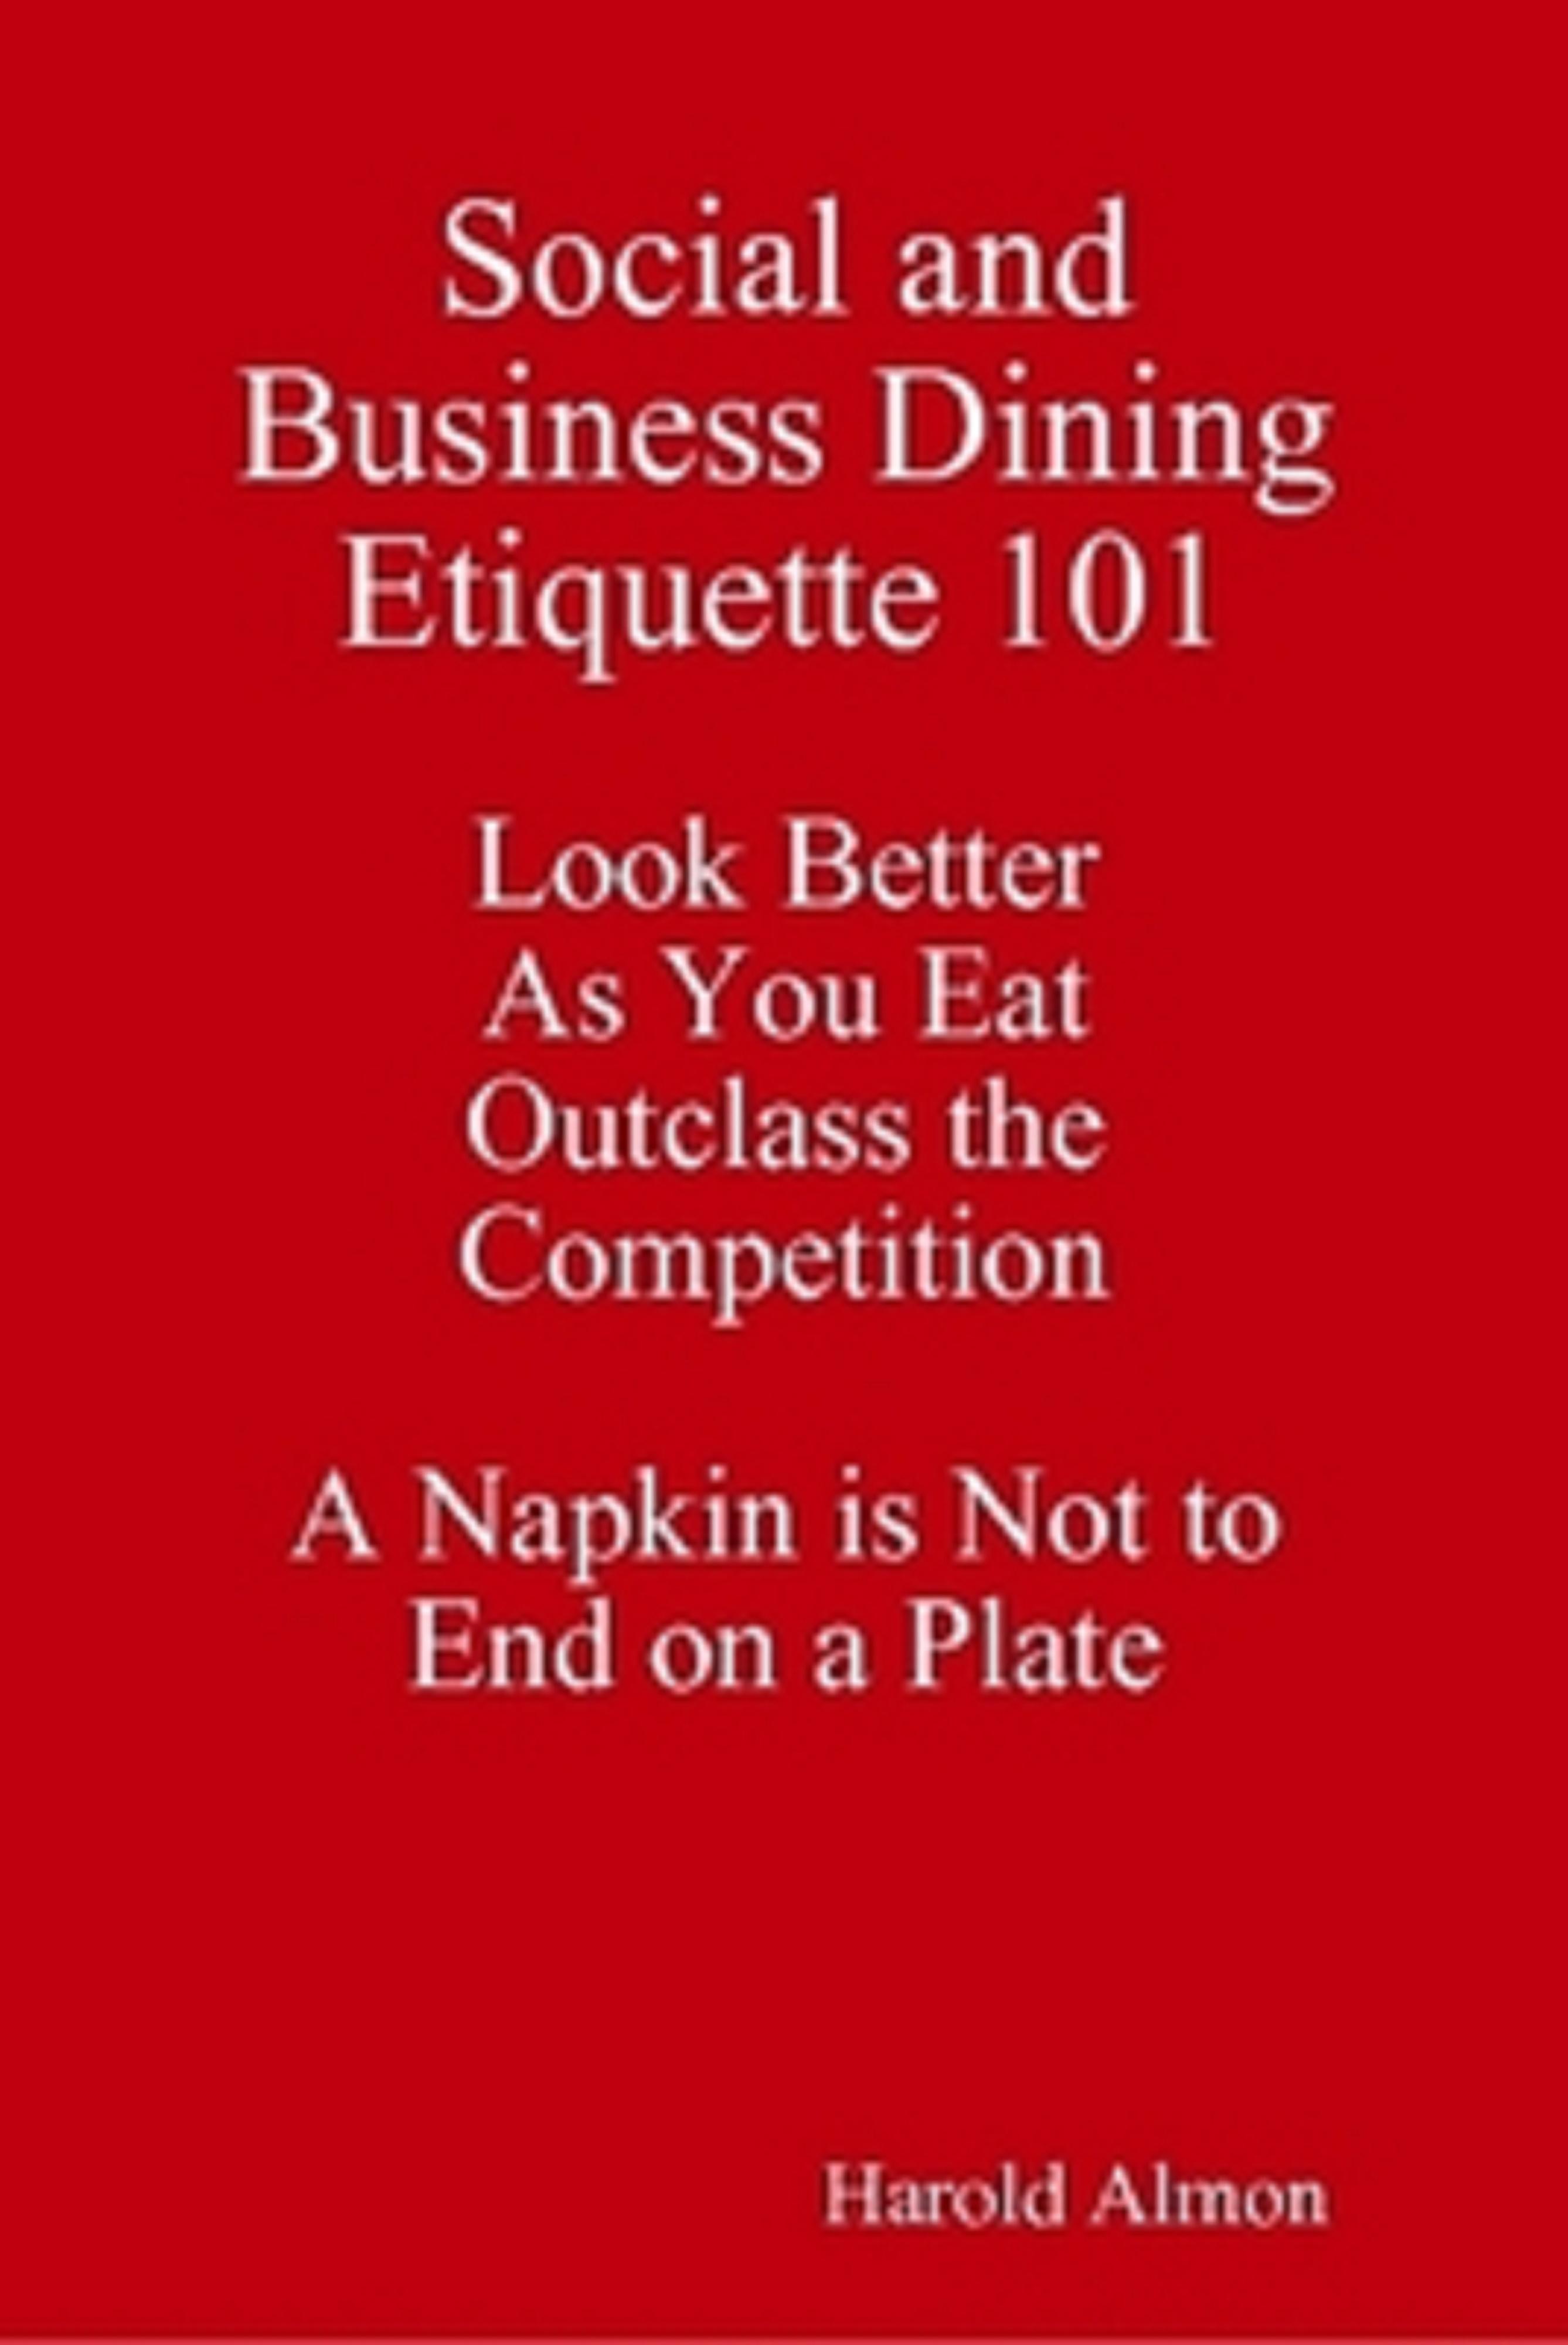 Etiquette Guide Social and Business Dining Etiquette 101